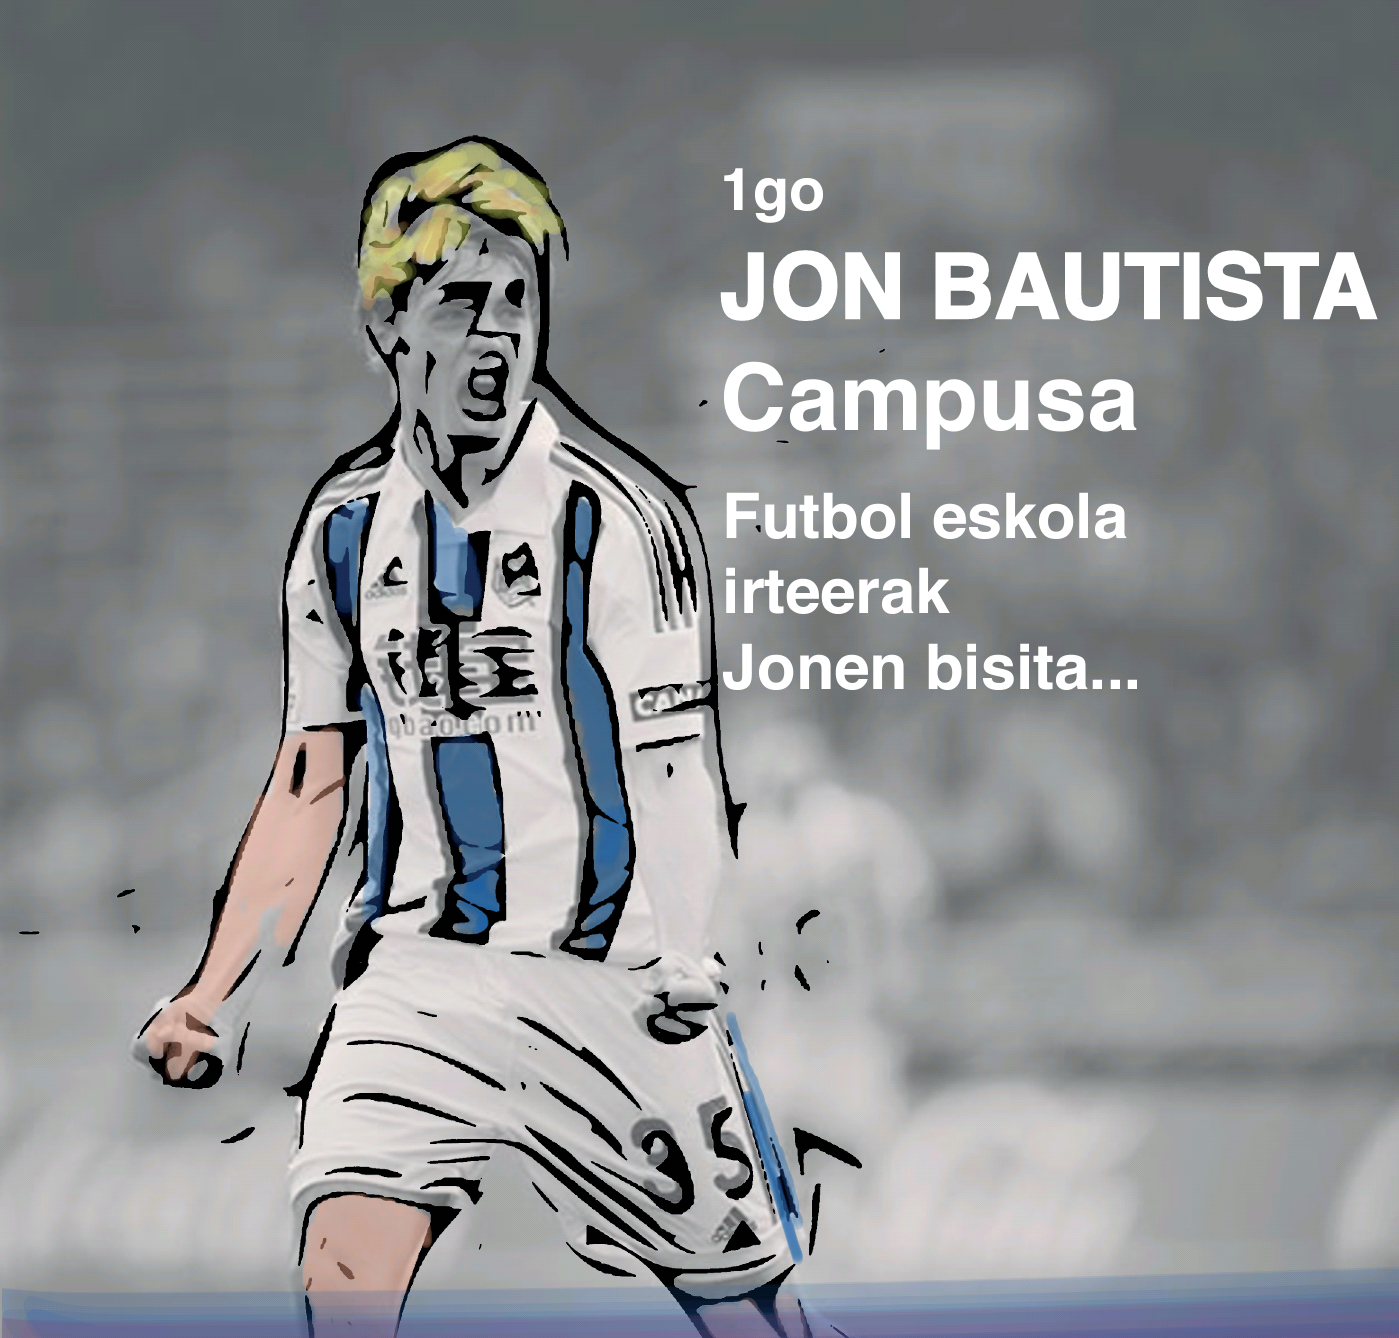 1er Campus Jon Bautista